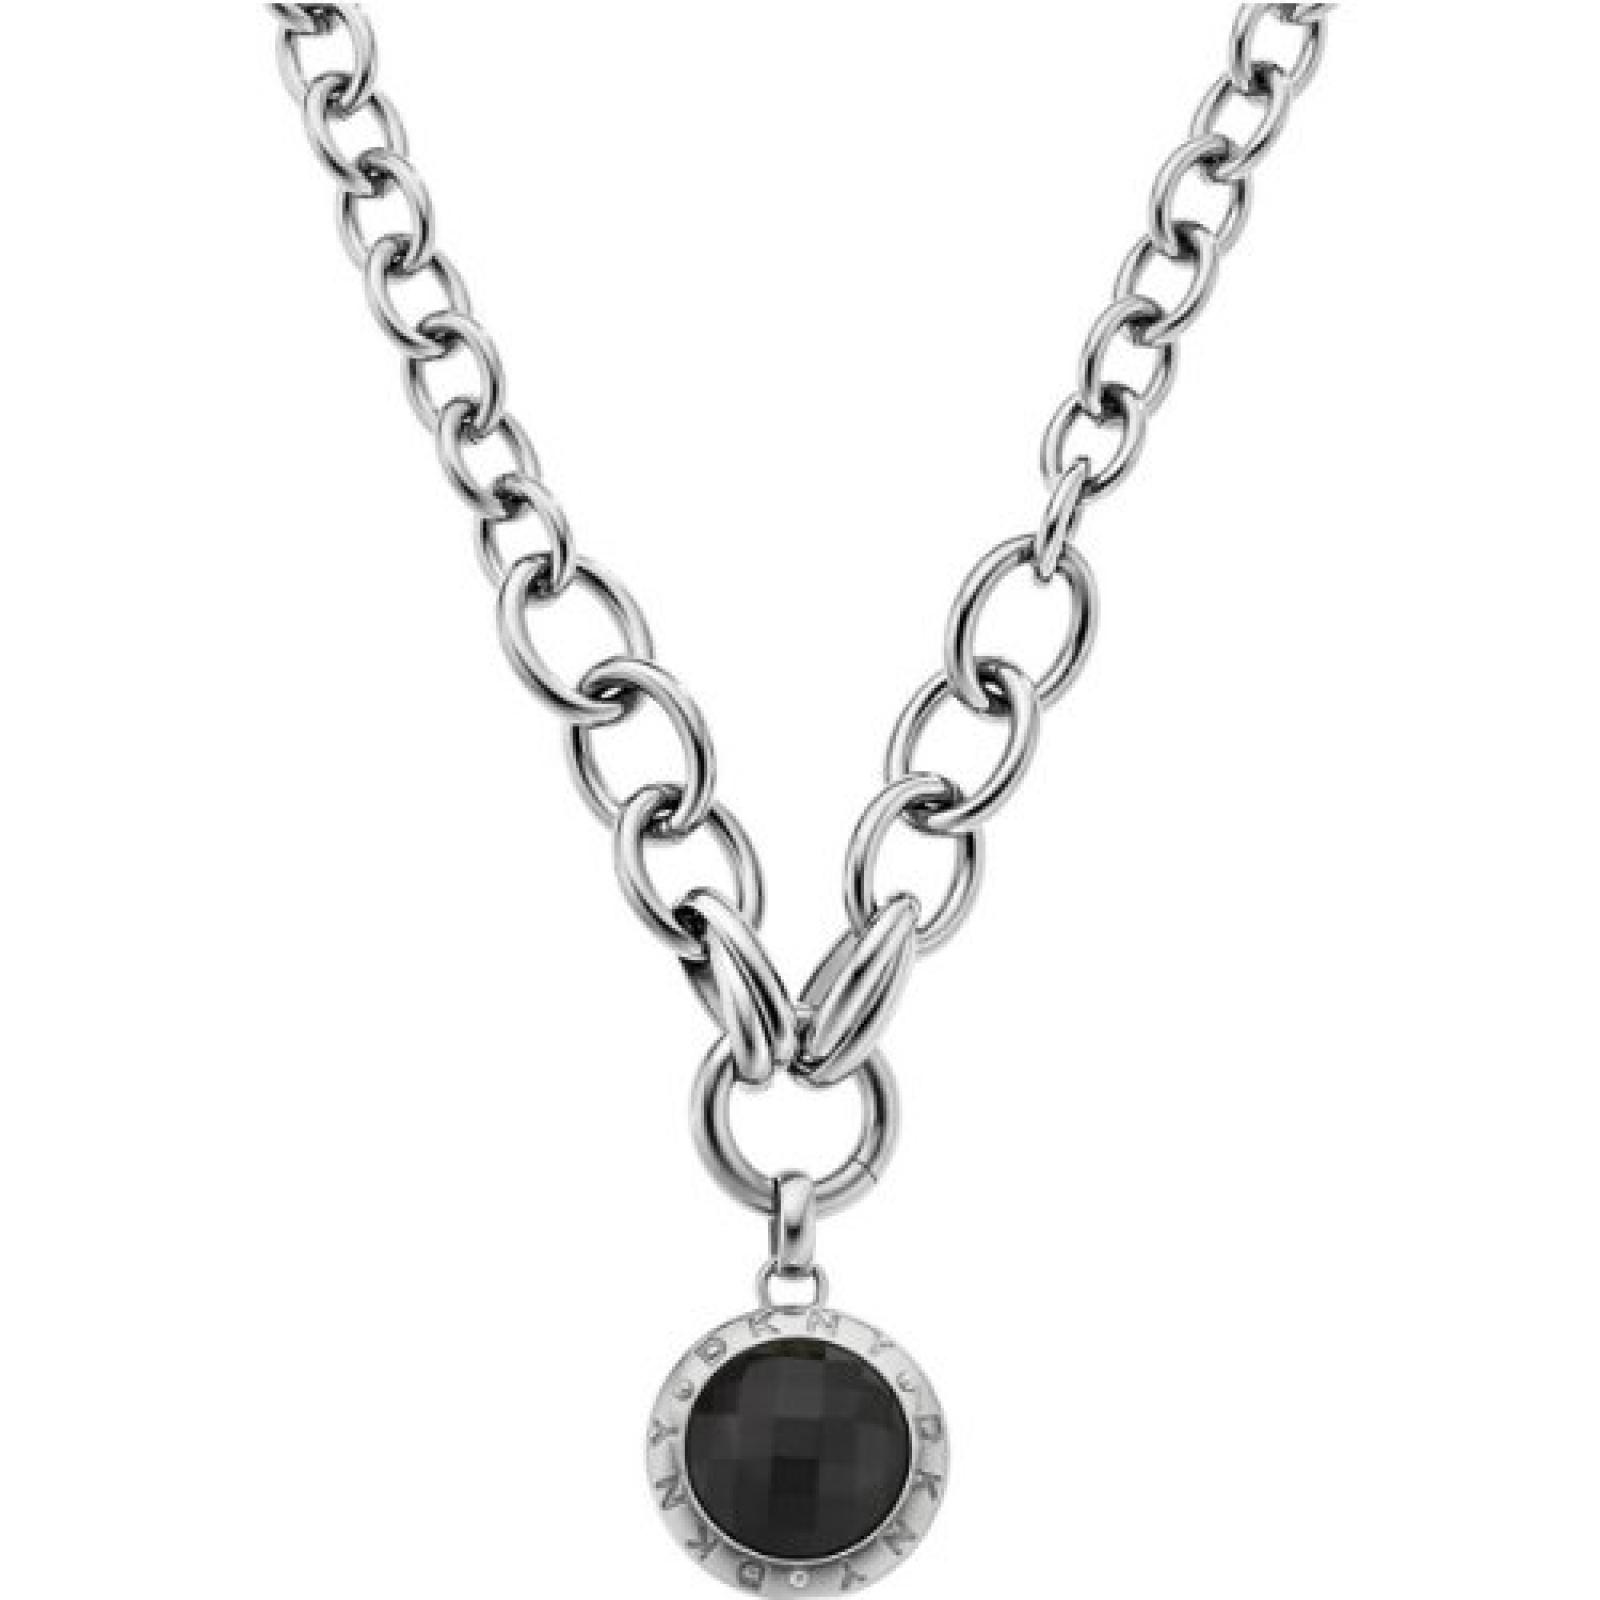 DKNY Damen Halskette Edelstahl Glaskristall schwarz NJ2054040